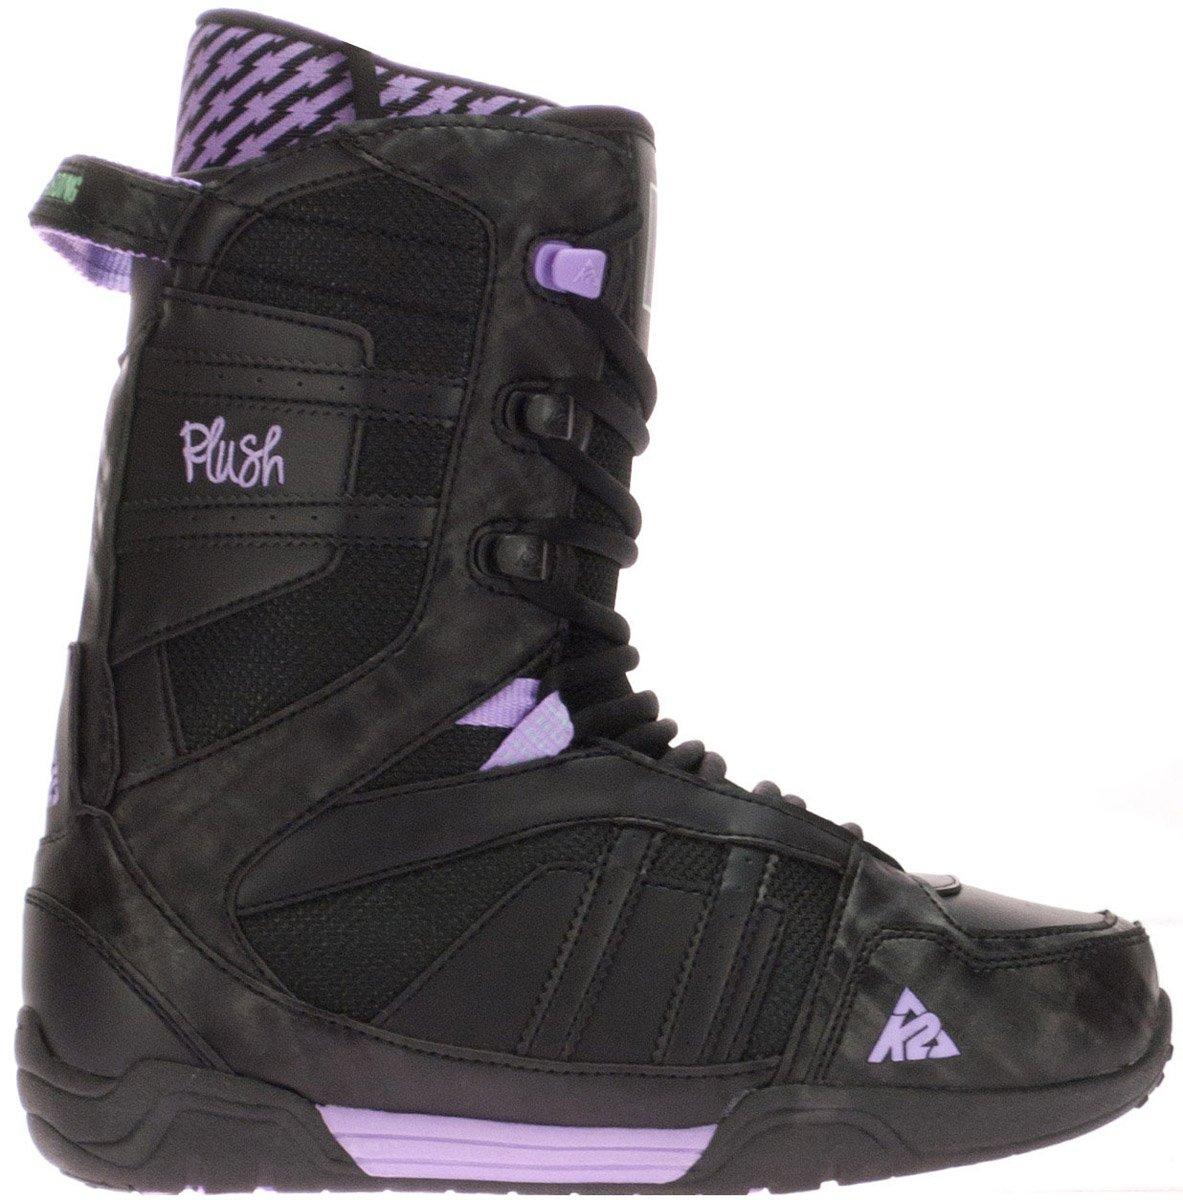 K2 Plush Snowboard Boot 2012, Black, 5